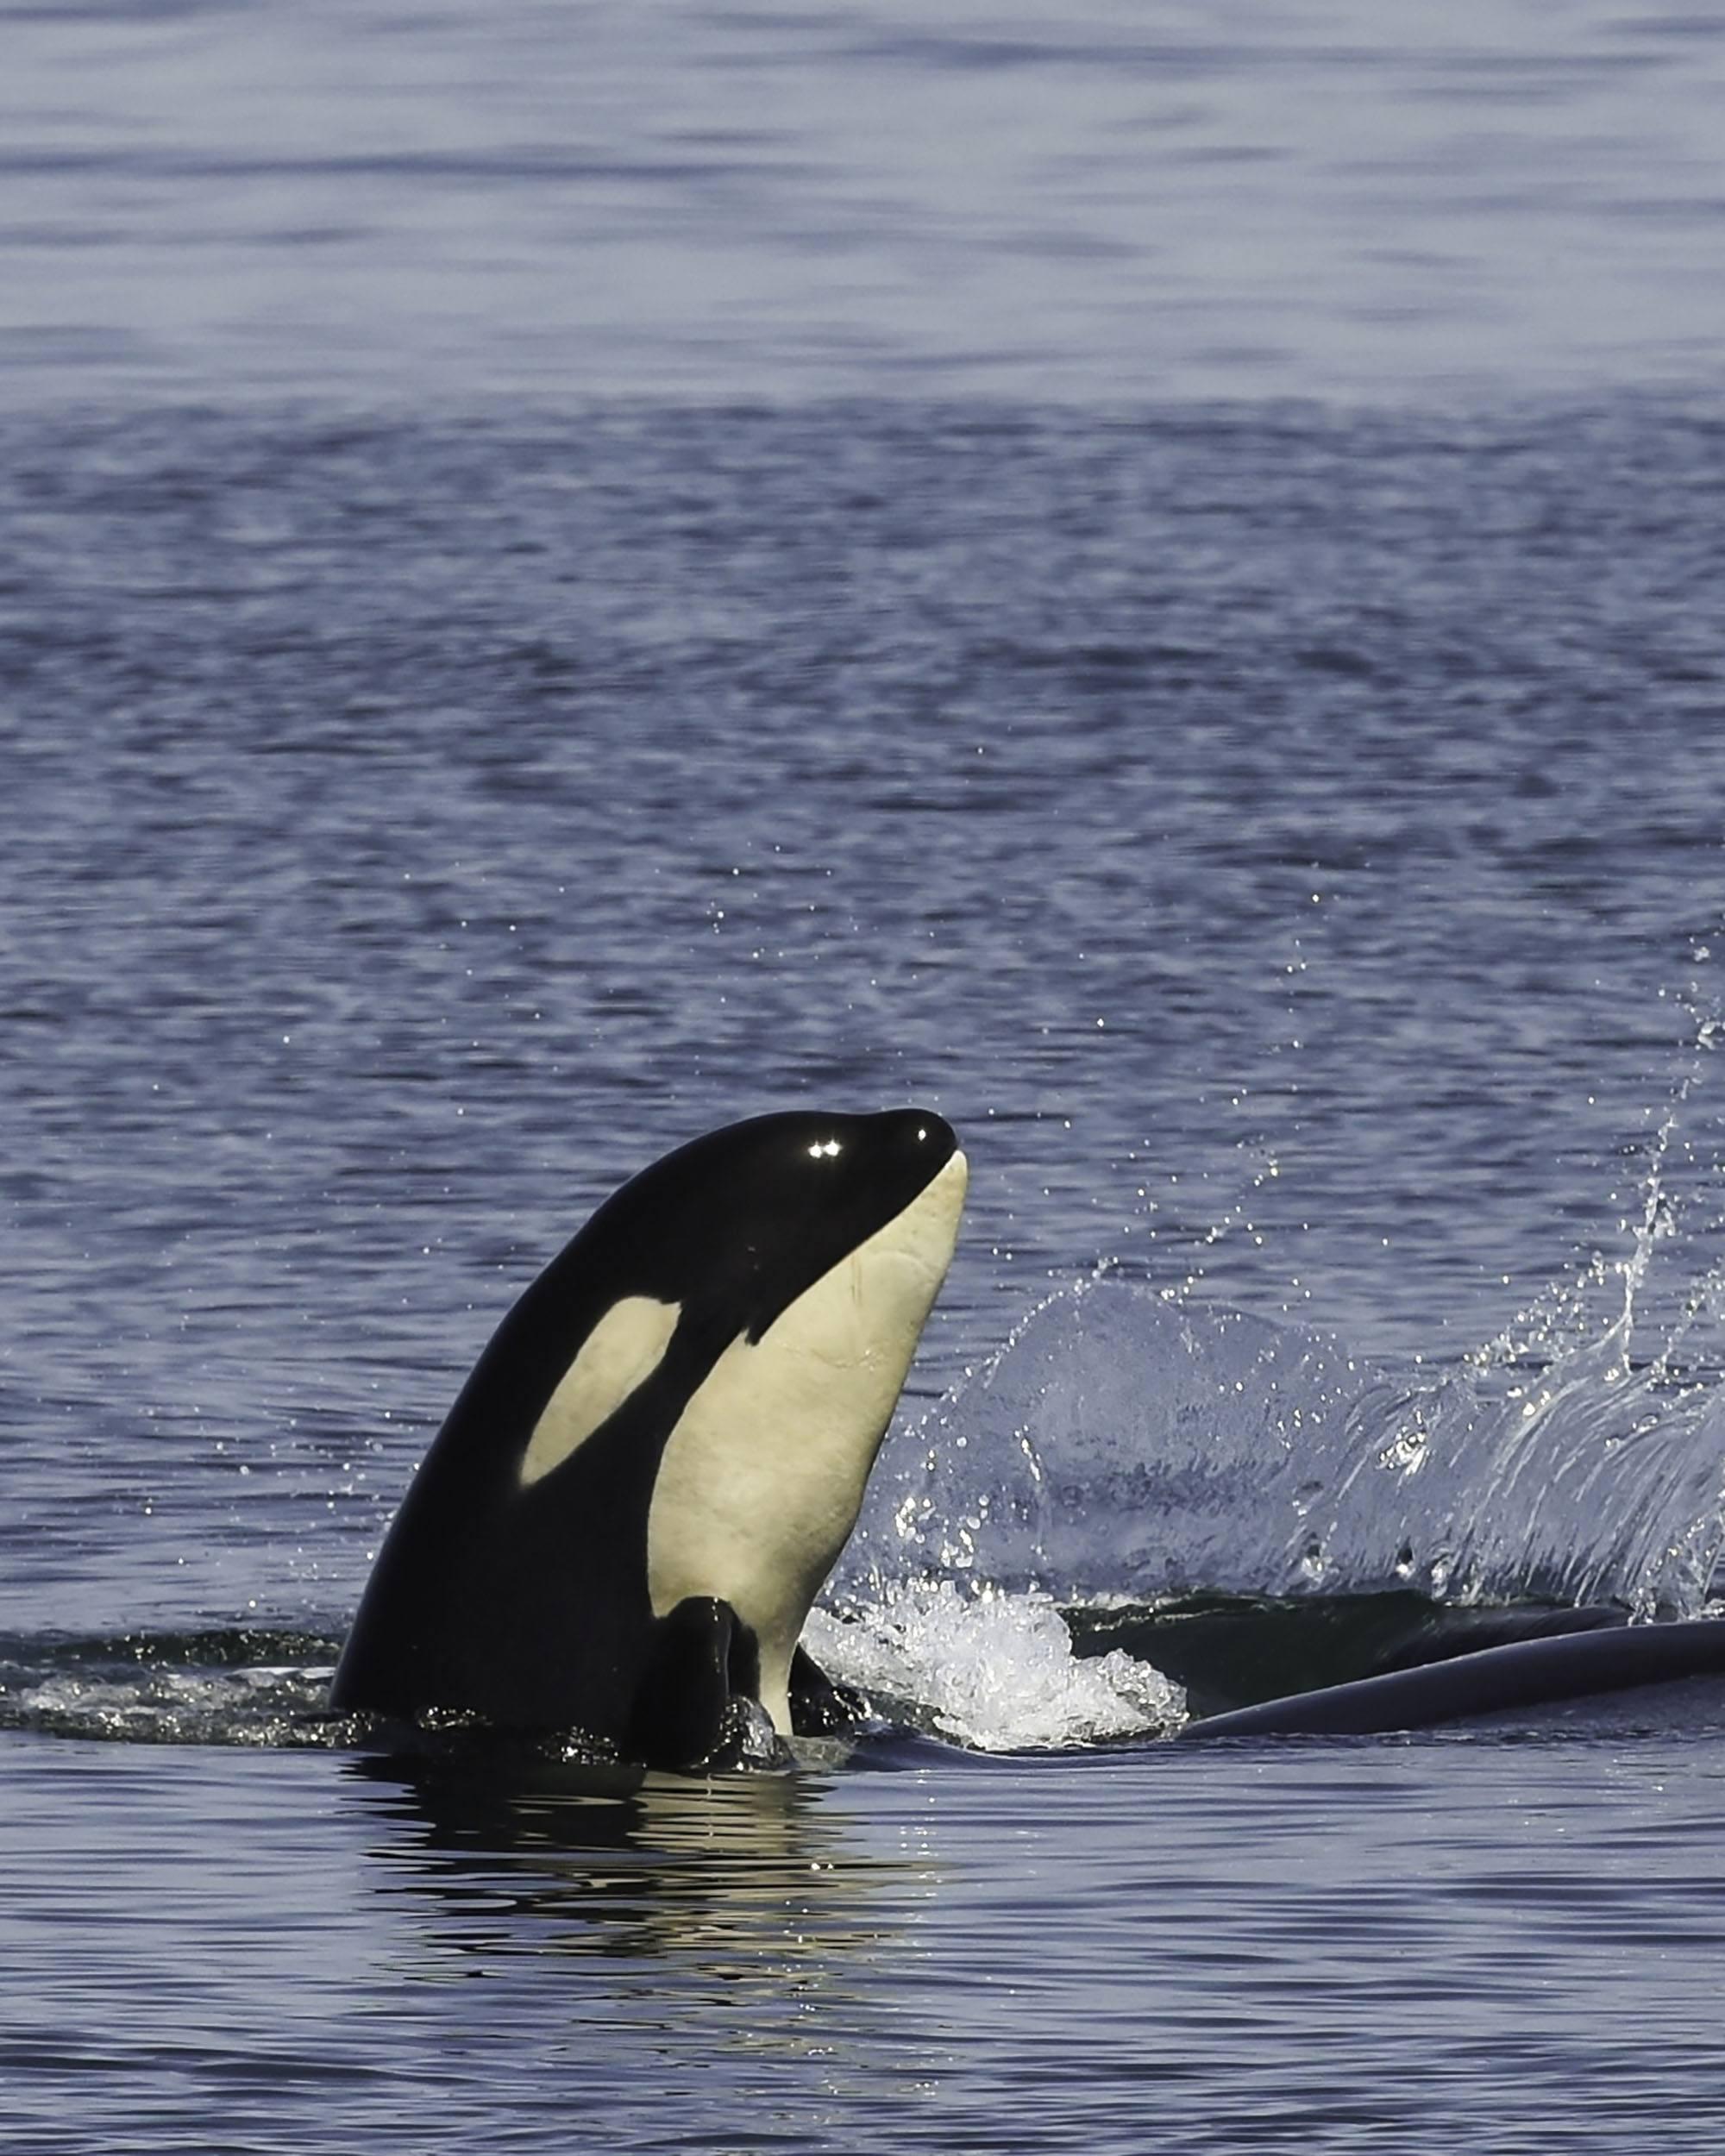 Orca calf Scarlett (J50). Photo by Naturalist/Capt Heather MacIntyre, Maya's Legacy Whale Watching, Friday Harbor, WA.